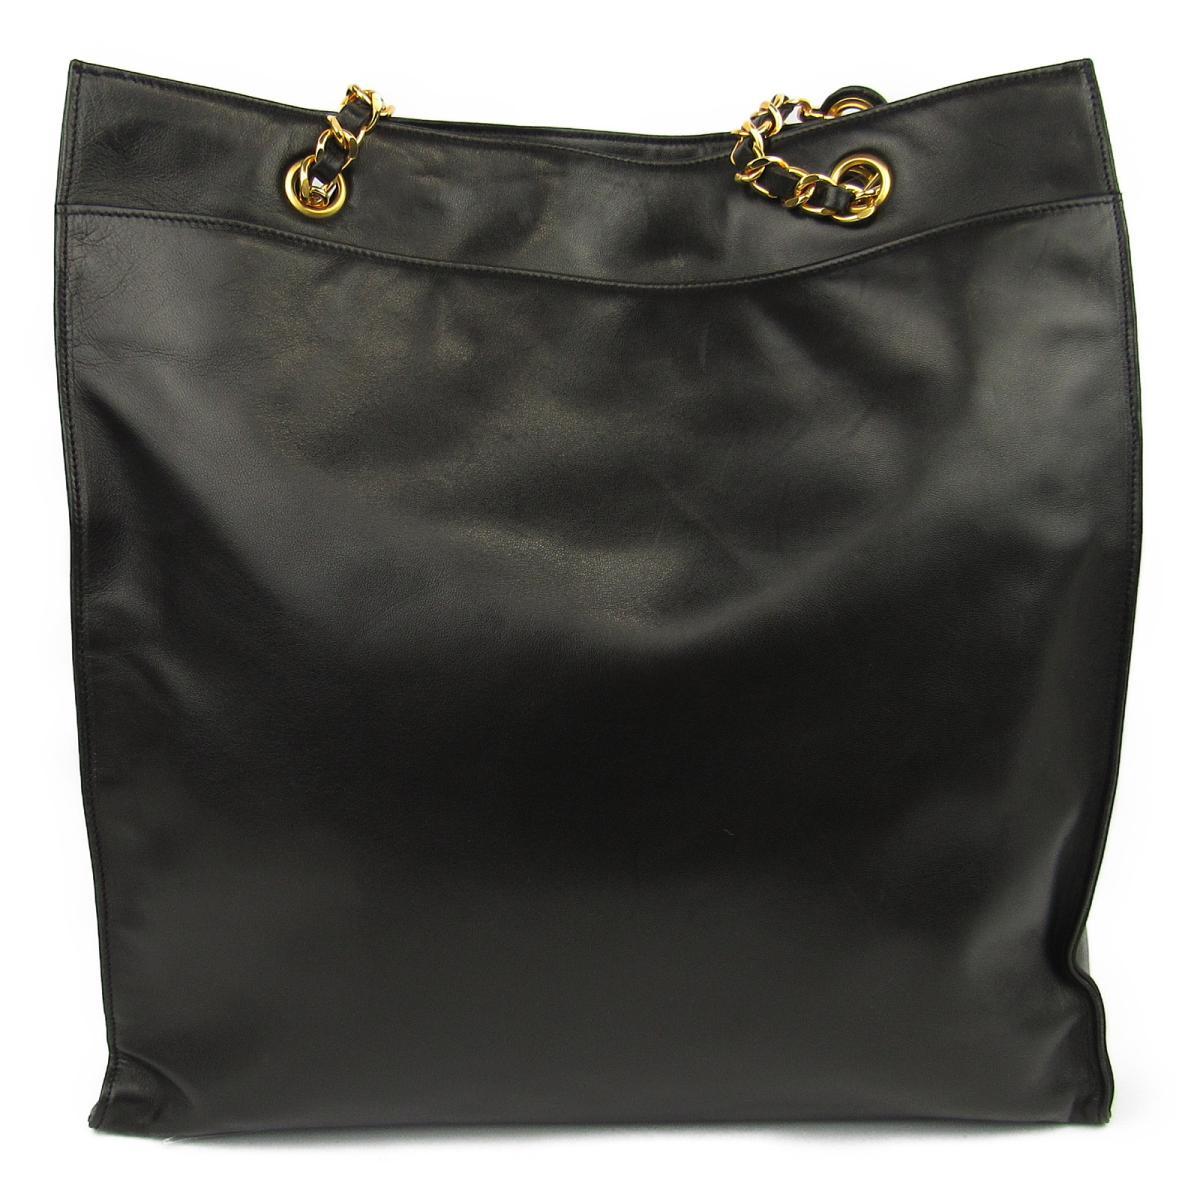 bdd80d8a9799 BRANDOFF  Authentic CHANEL Coco Shoulder Tote Bag leather Black ...